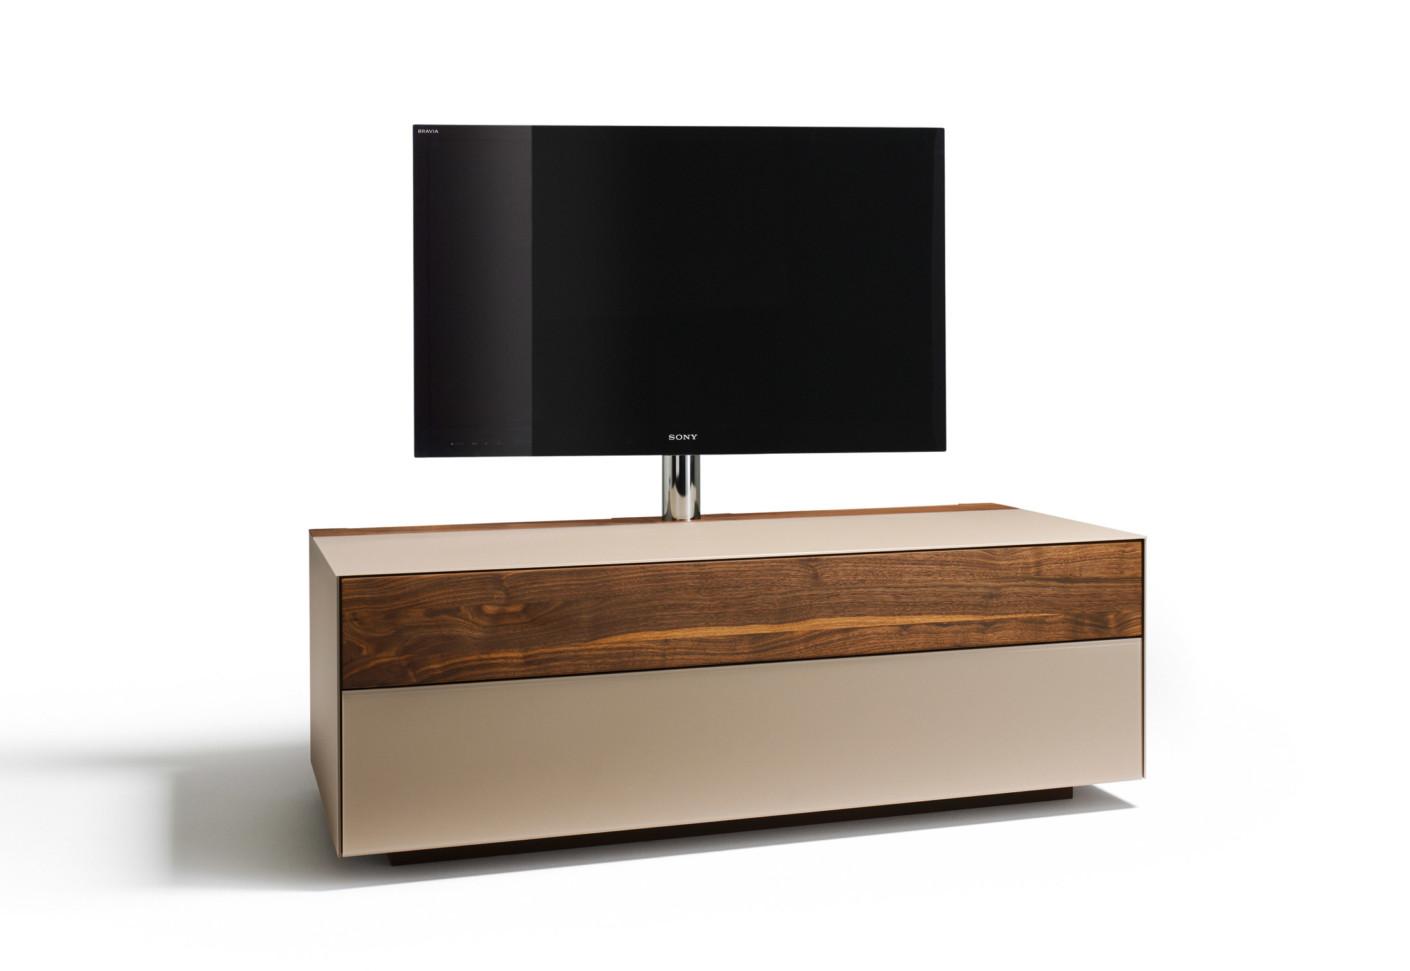 cubus pure home entertainment von team 7 stylepark. Black Bedroom Furniture Sets. Home Design Ideas